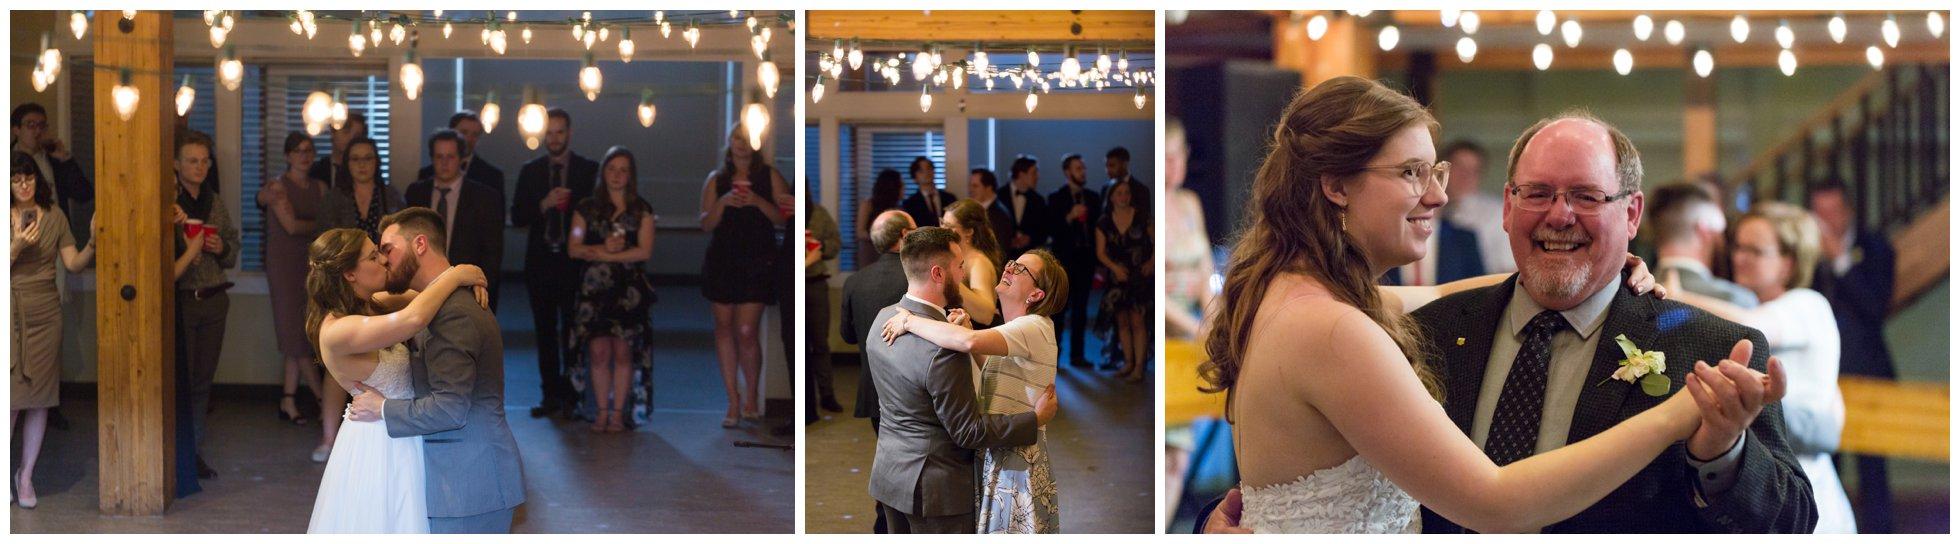 Emily and Royden Edmonton Wedding (Life by Selena Photography)_0061.jpg